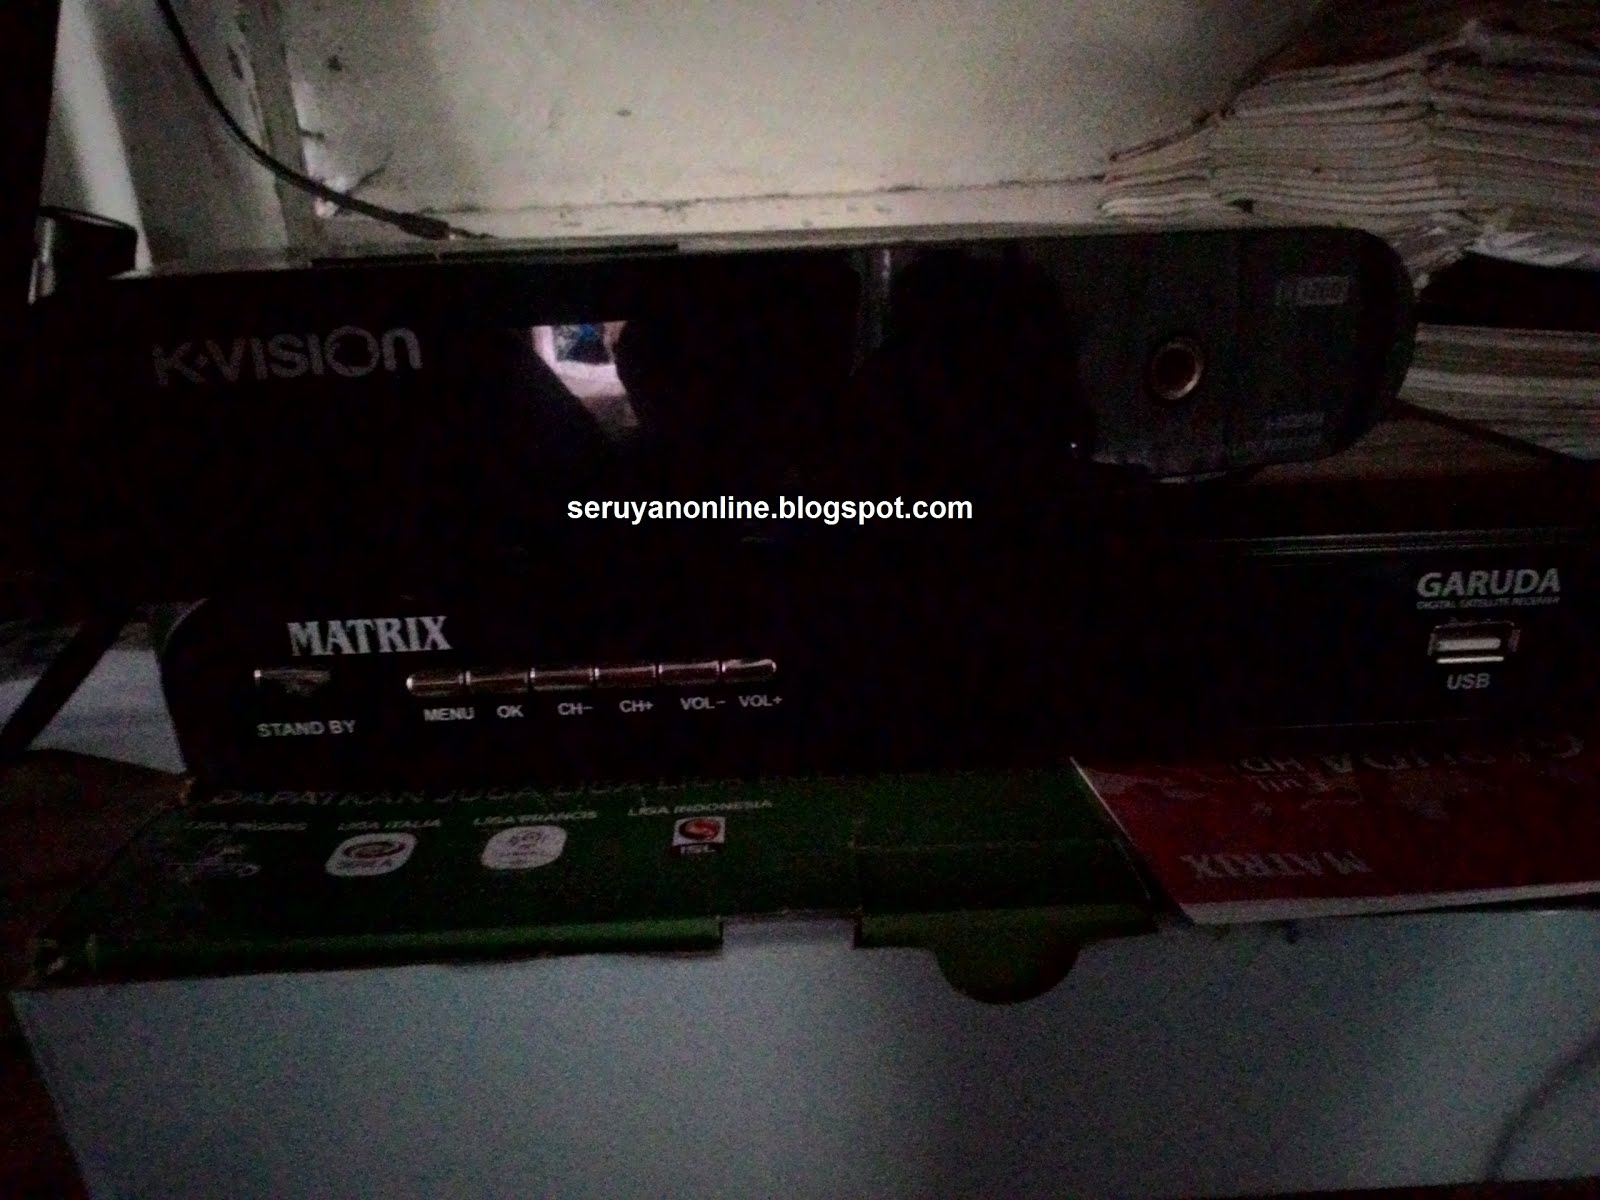 kvision K1200